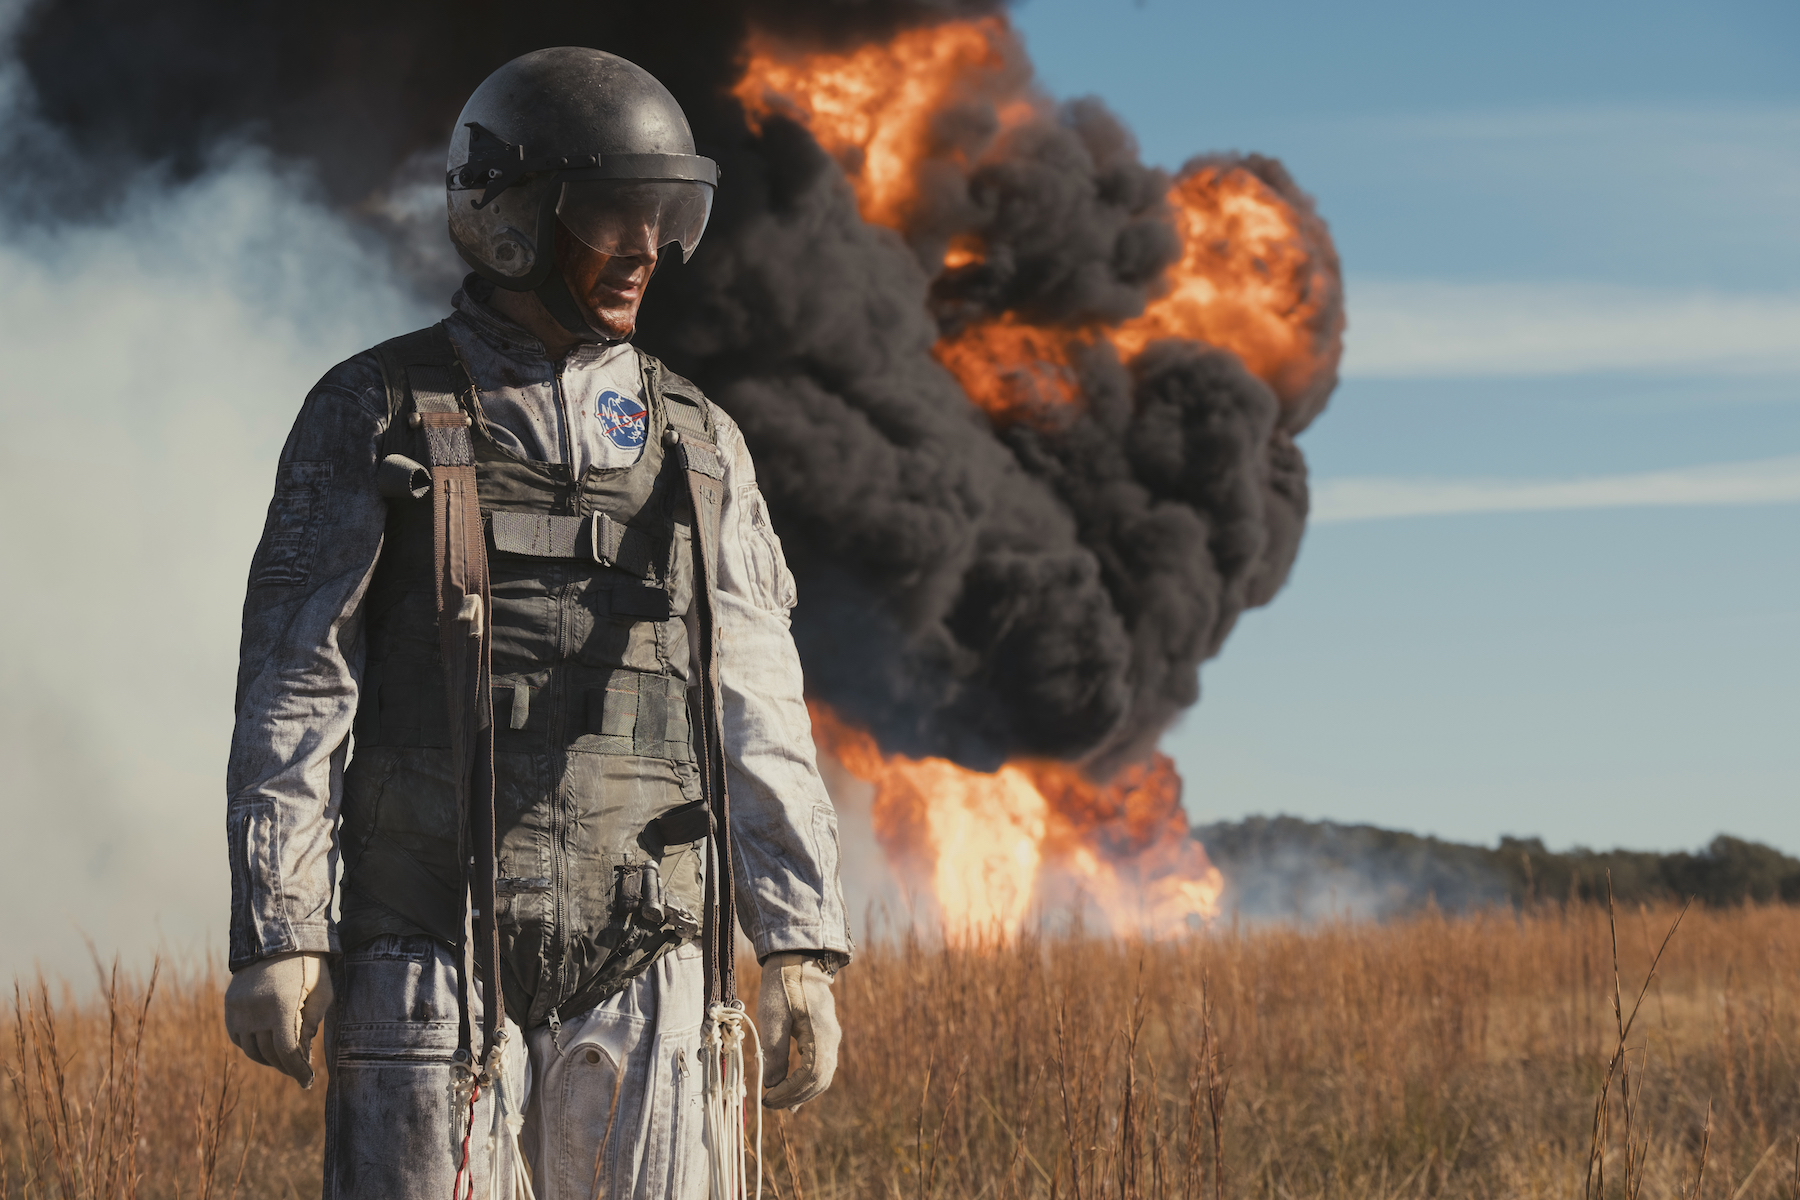 USAF, Hollywood Partner During Making of 'First Man'